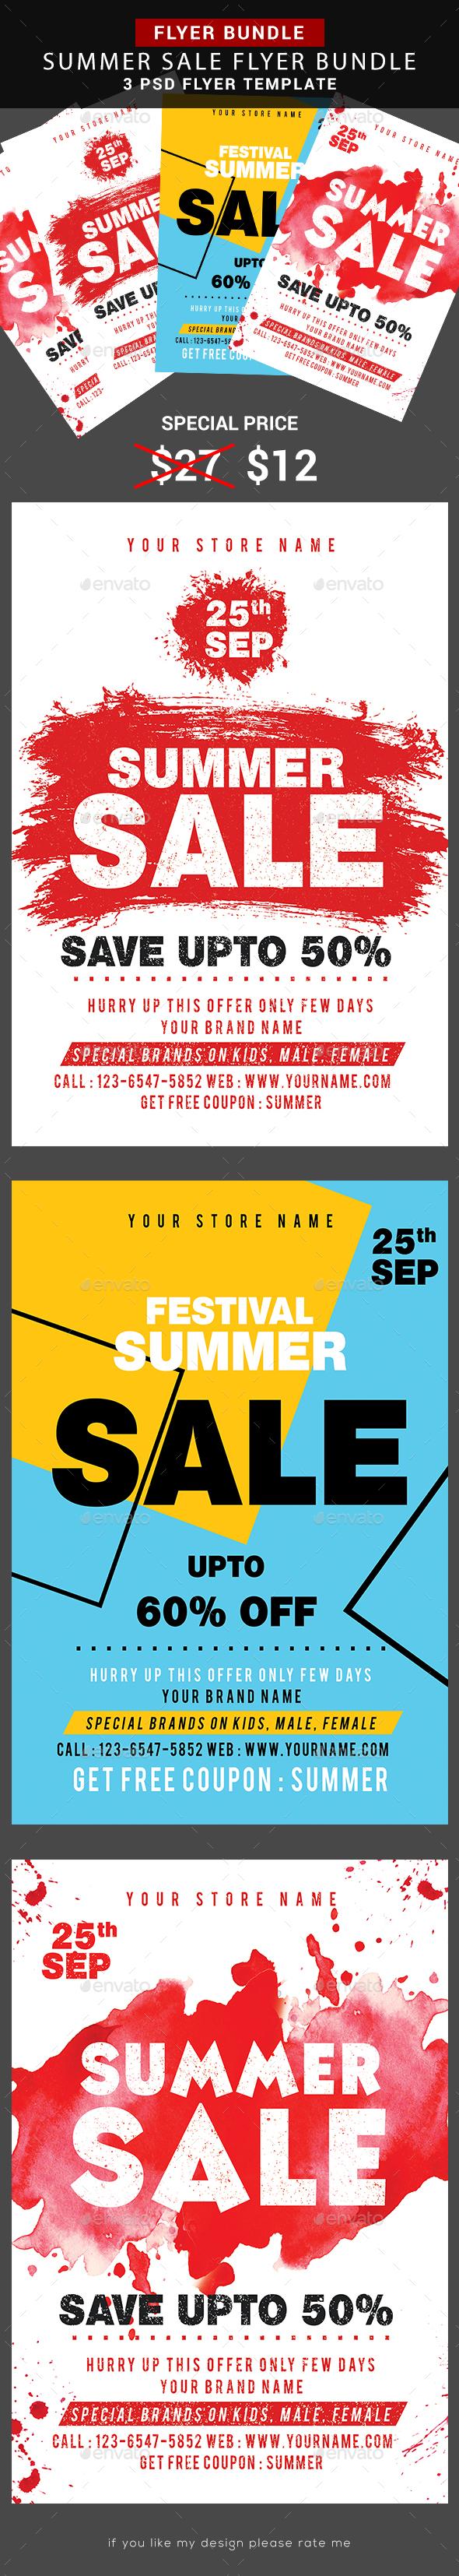 Summer Sale Flyer Bundle - Flyers Print Templates